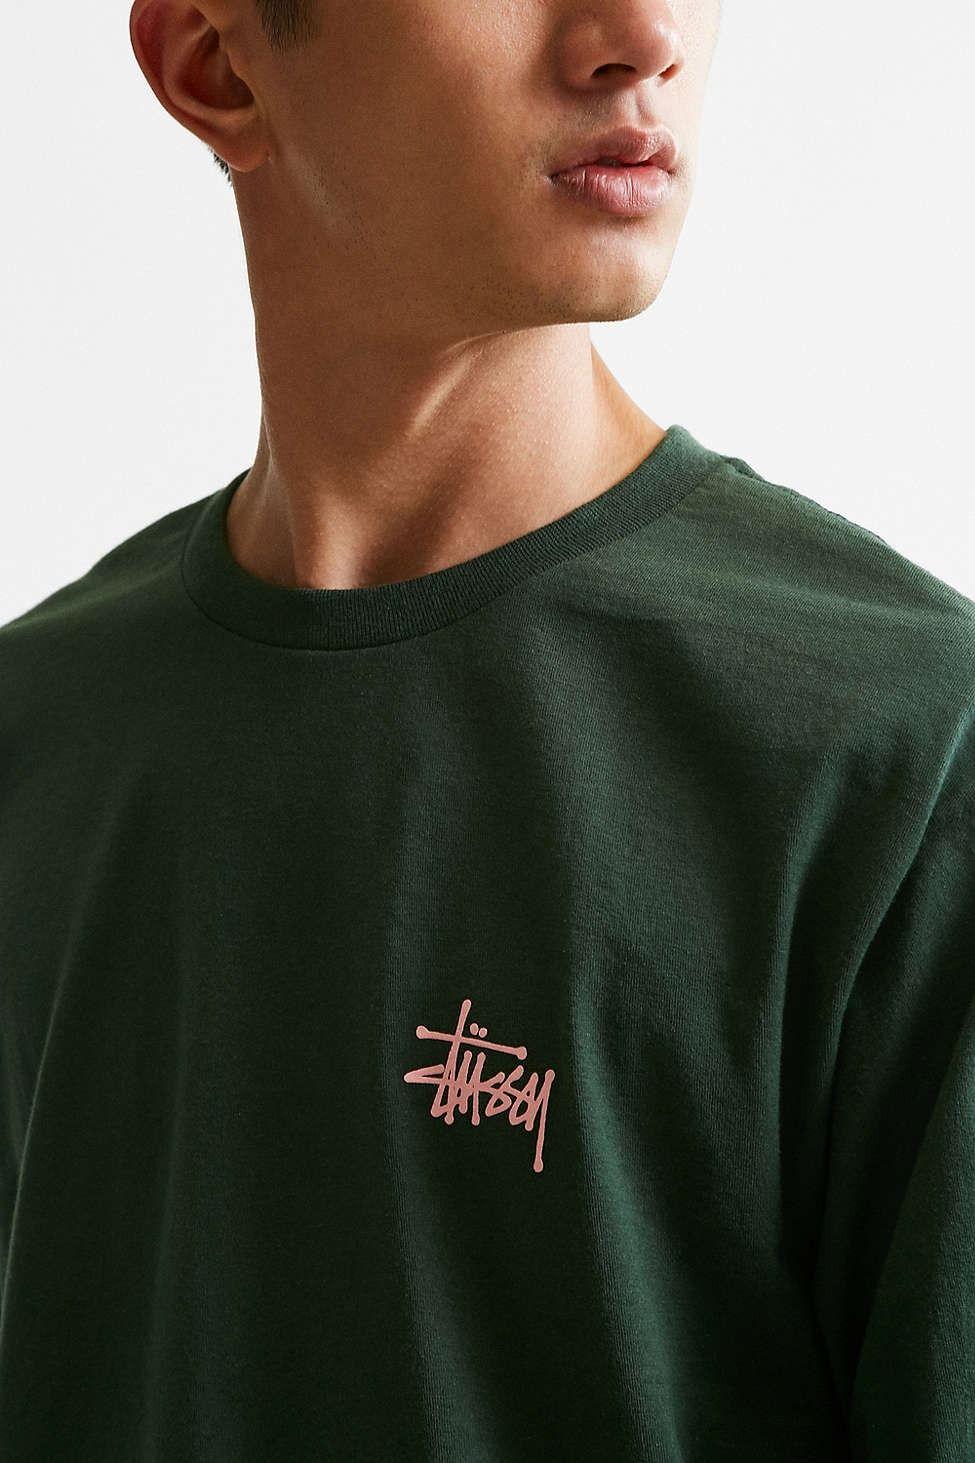 Basic Long Sleeve Tee Shirt